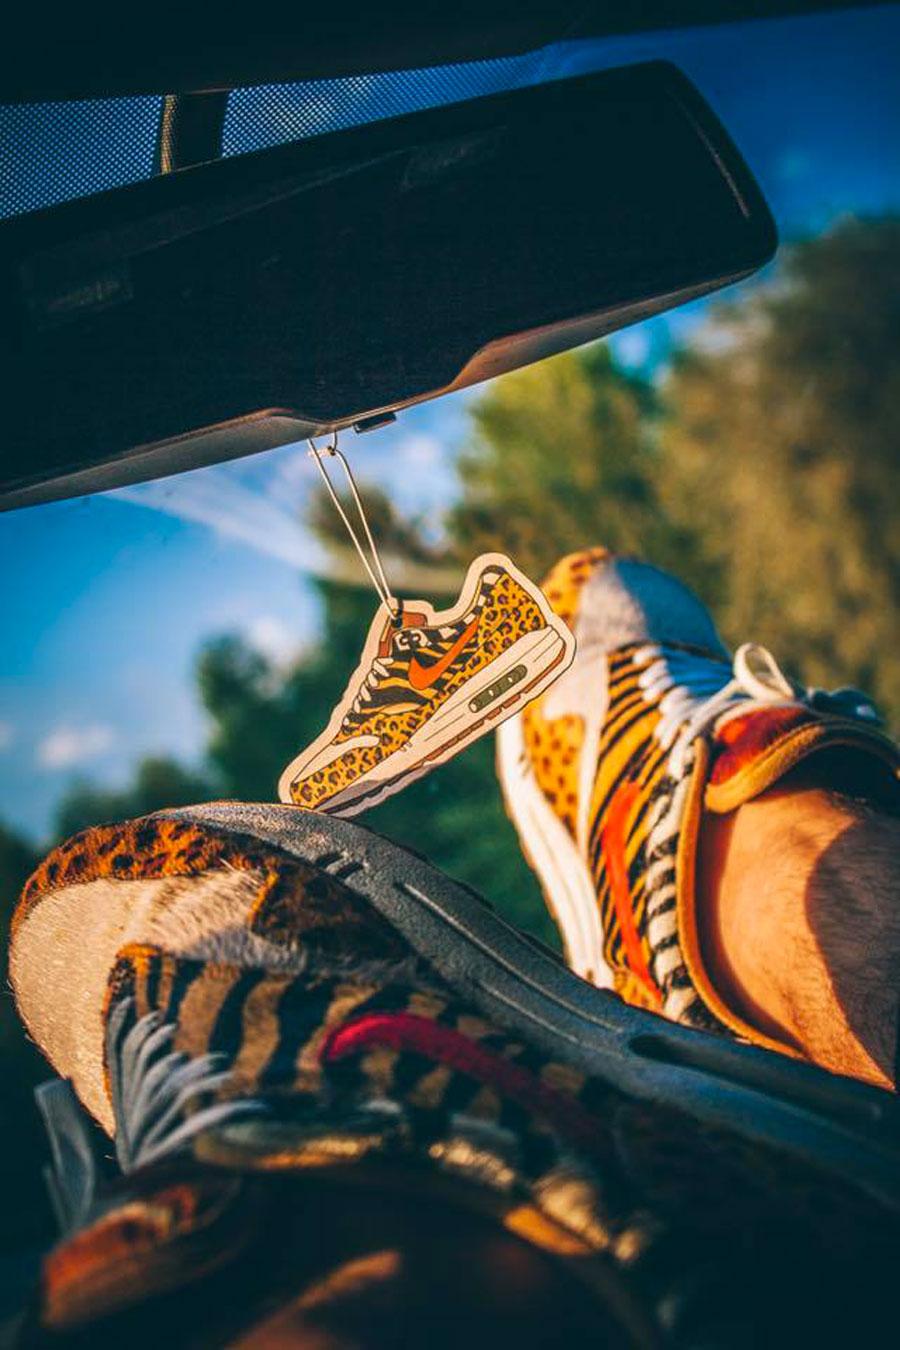 Heat on Feet Air Max Only - Yannik Loehr